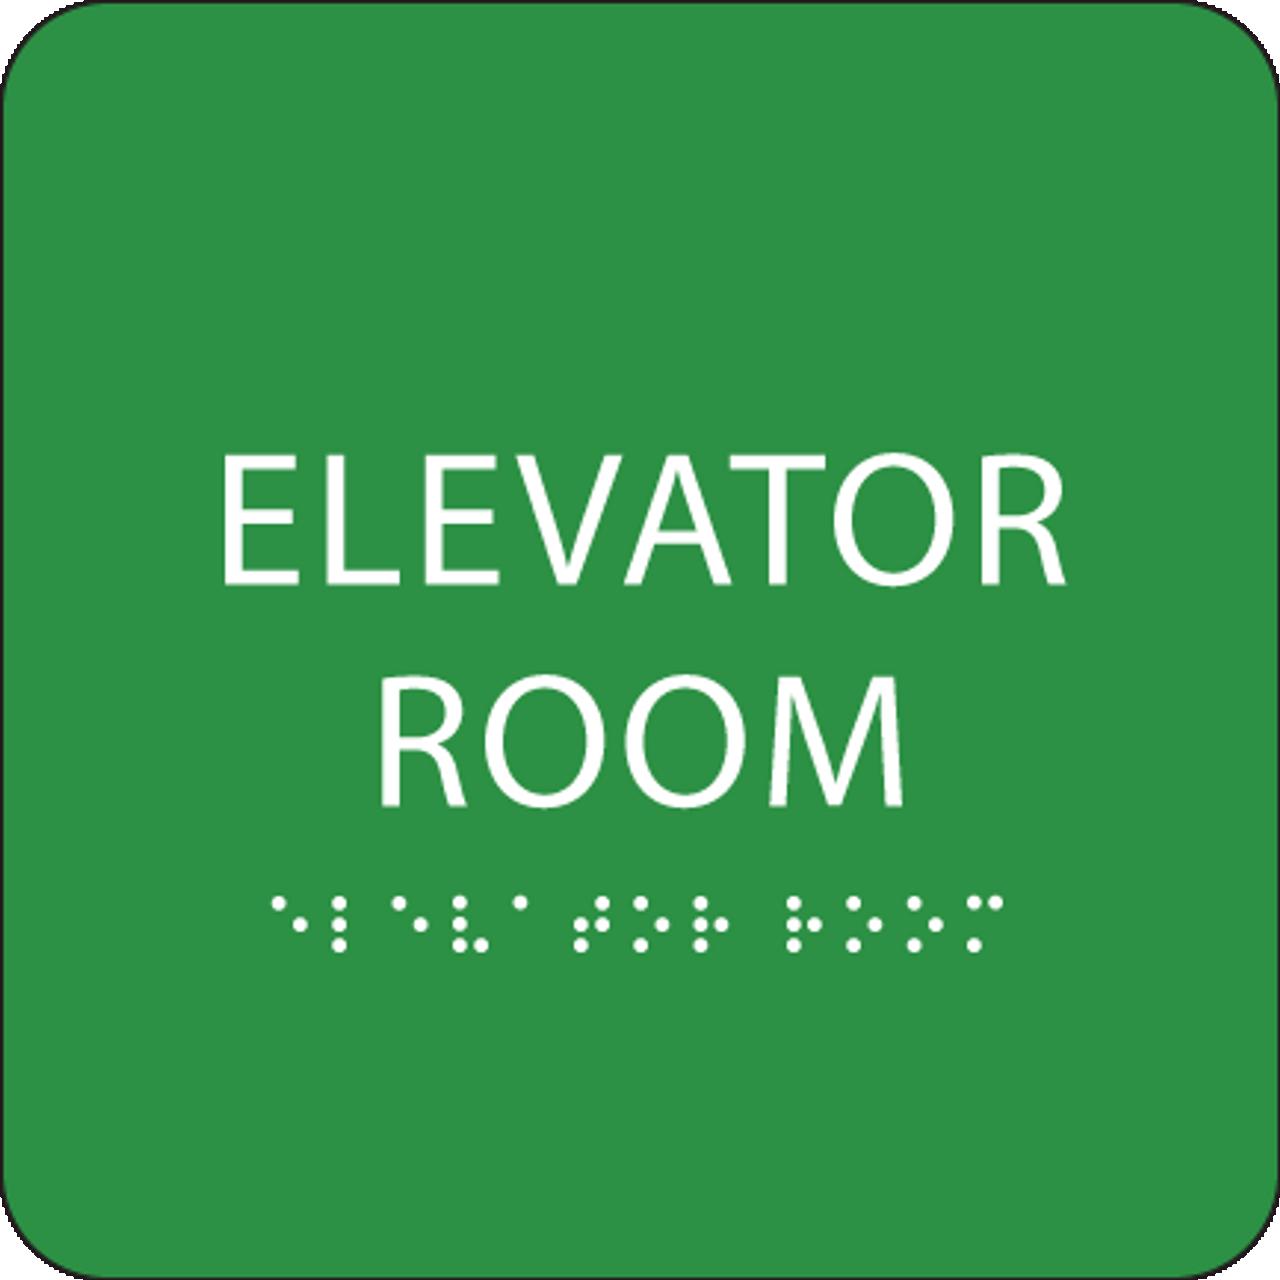 Green Elevator Room Braille Sign